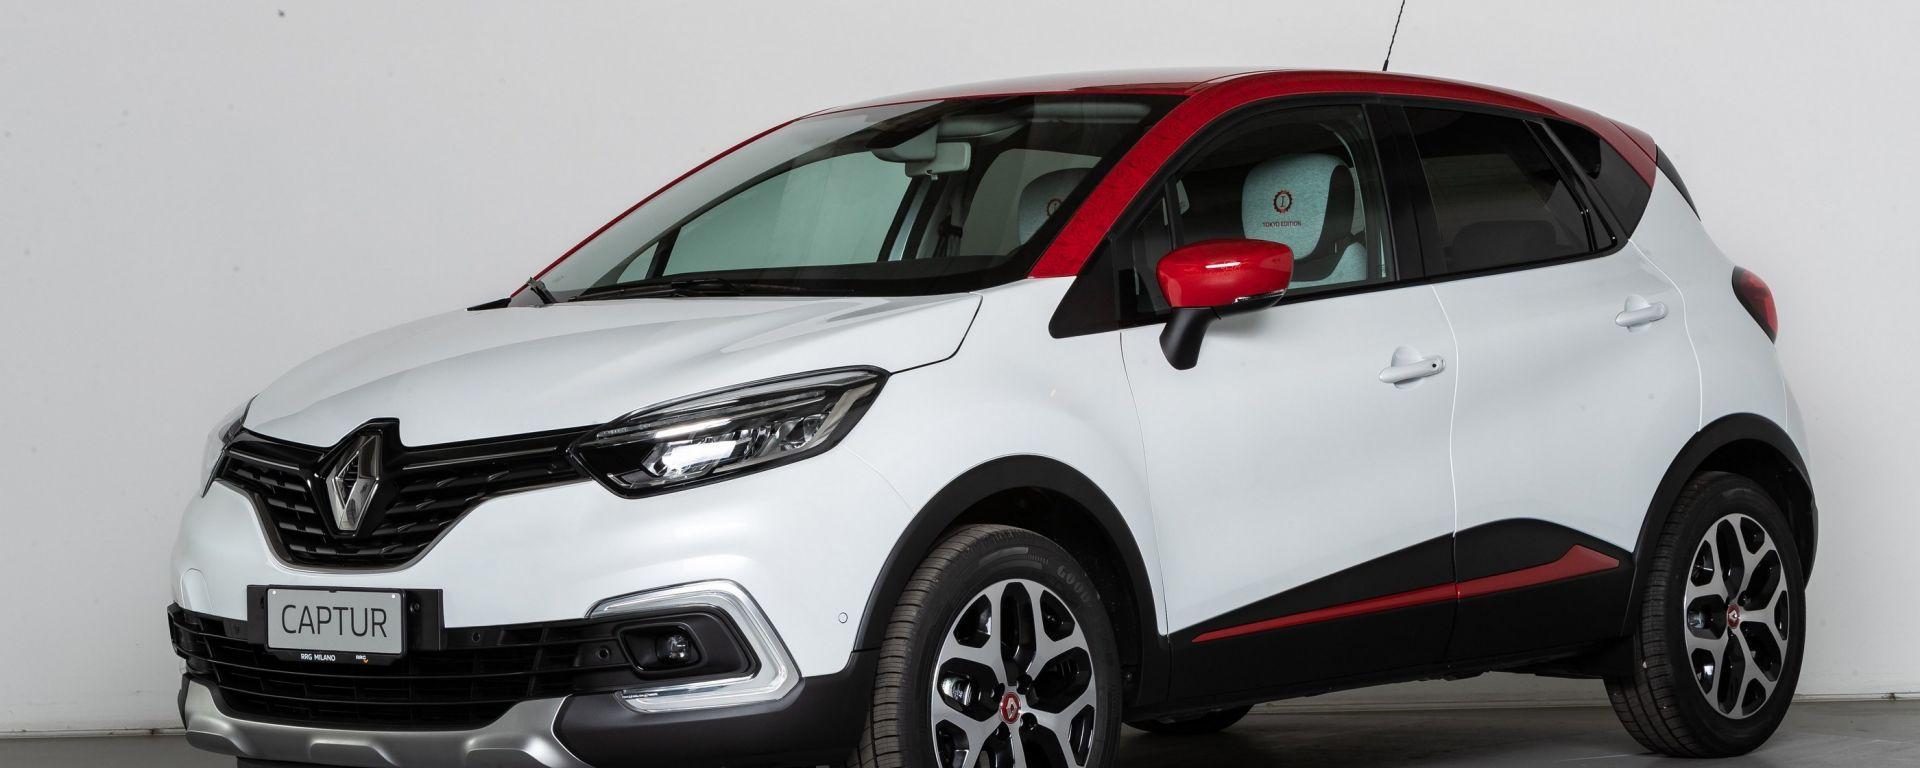 Renault Captur Tokyo Edition